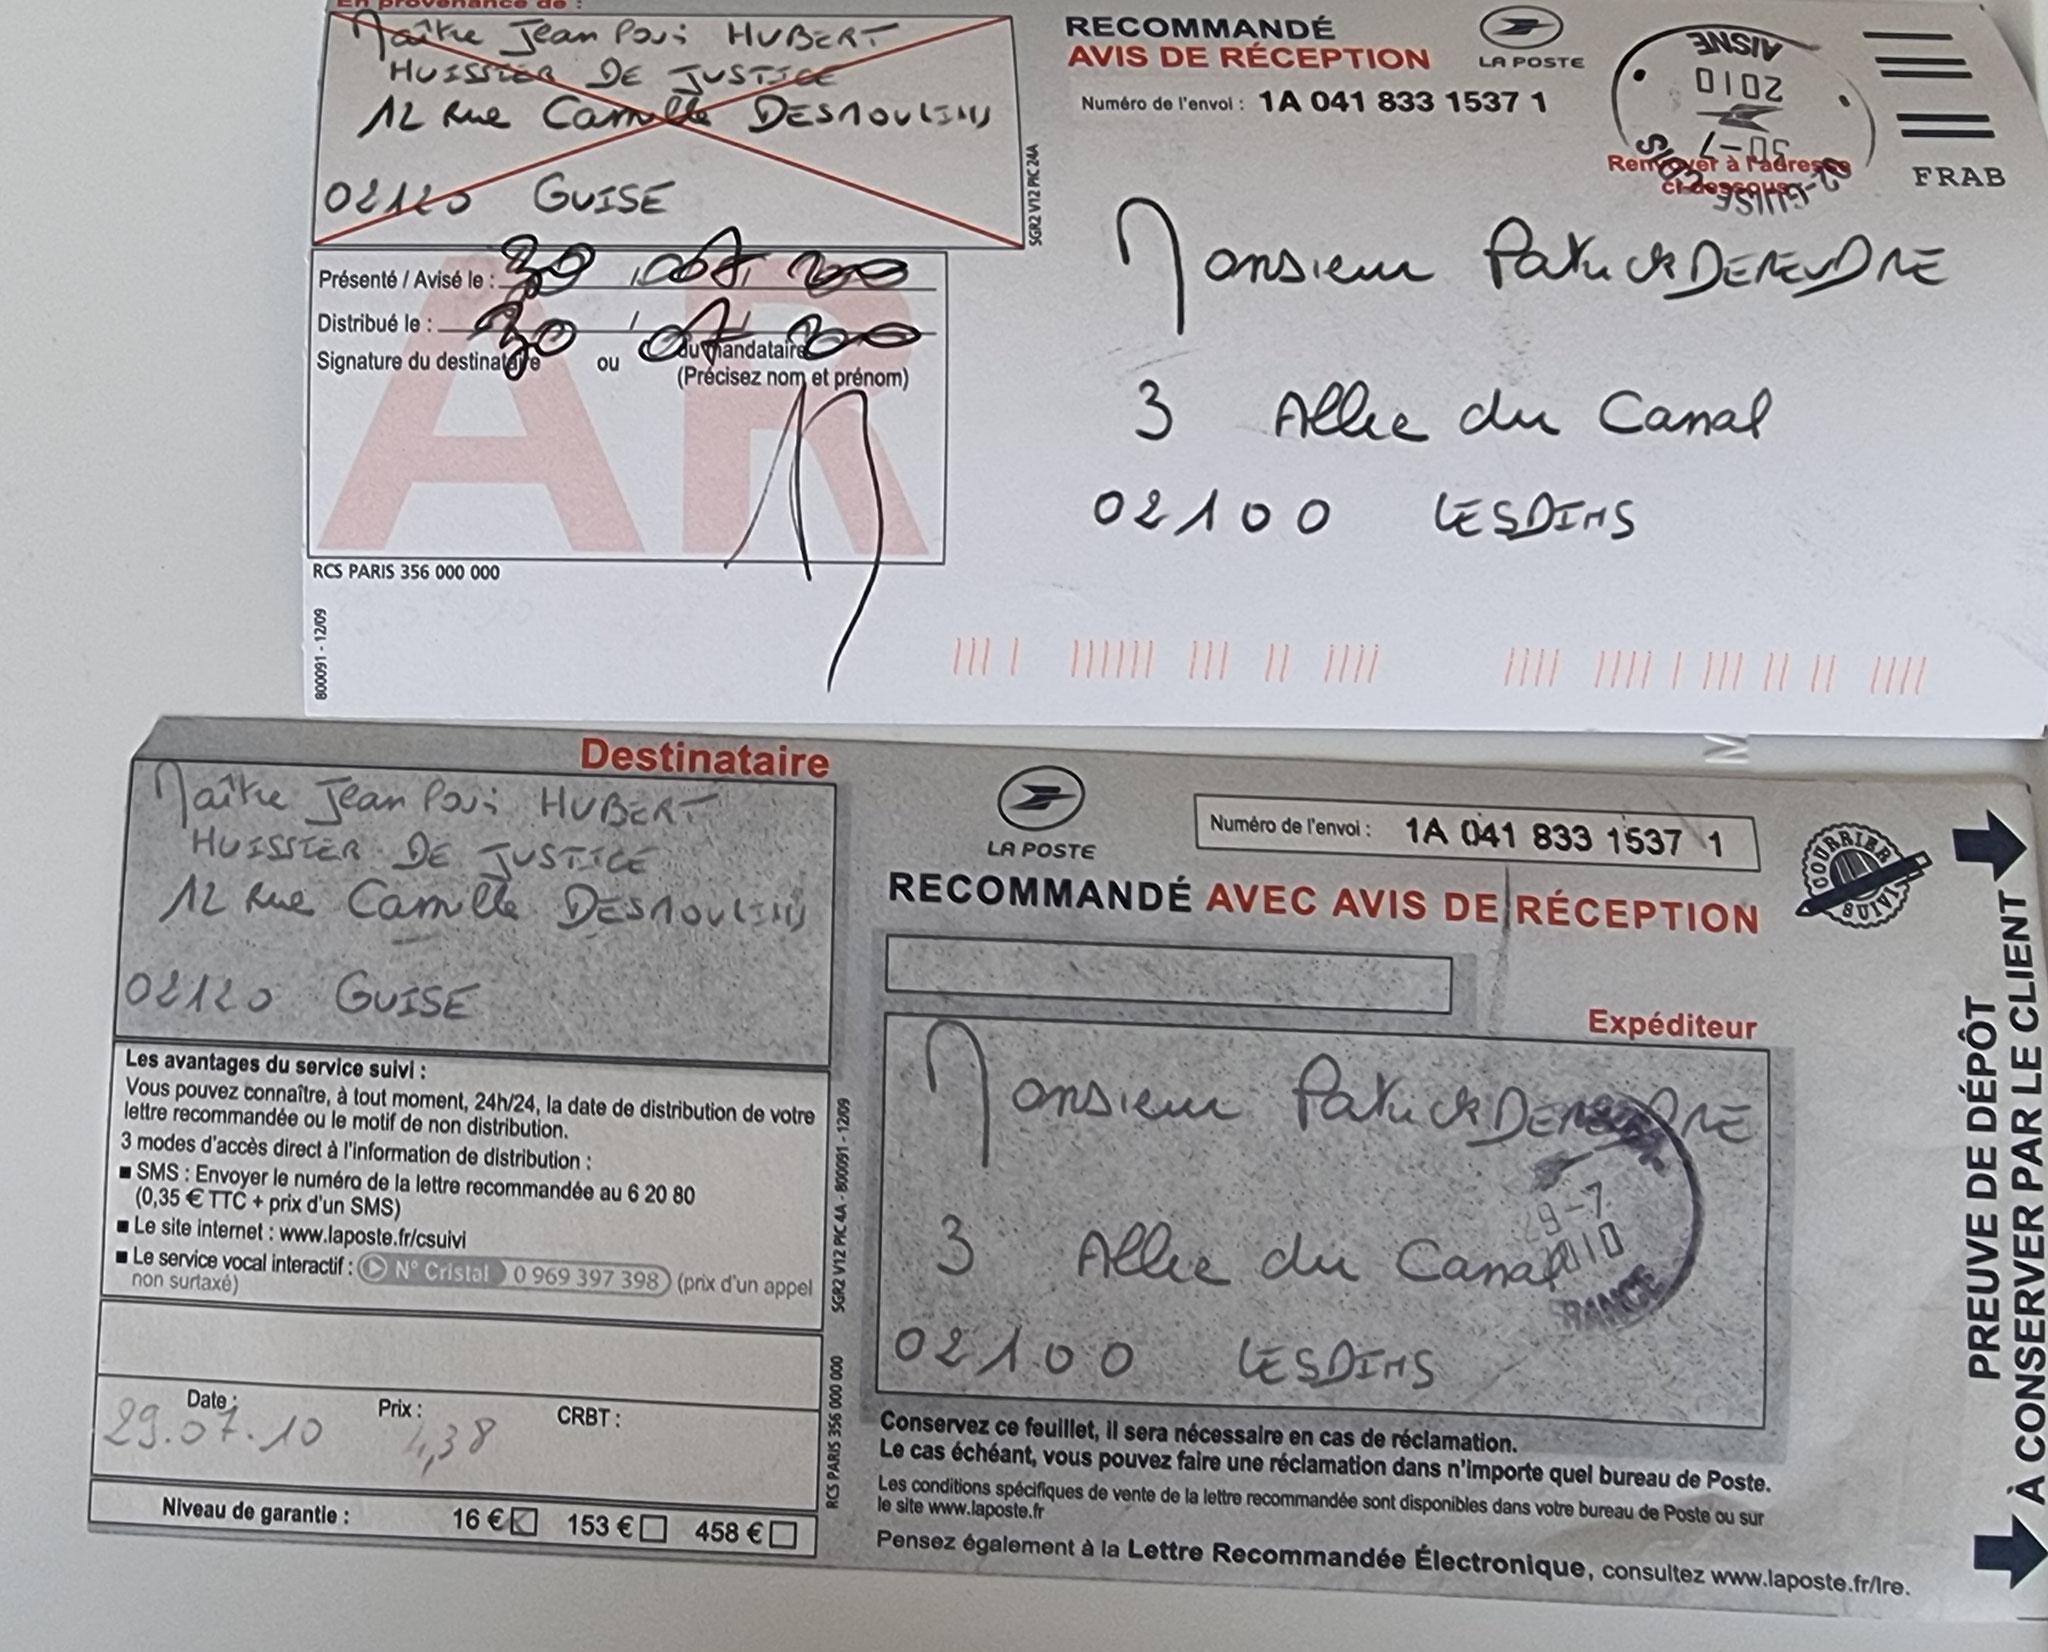 Le 29 Juillet 2010 j'adresse une LRAR à Maître HUBERT huissier de JUSTICE  www.jenesuispasunchien.fr www.jesuisvictime.fr www.jesuispatrick.fr